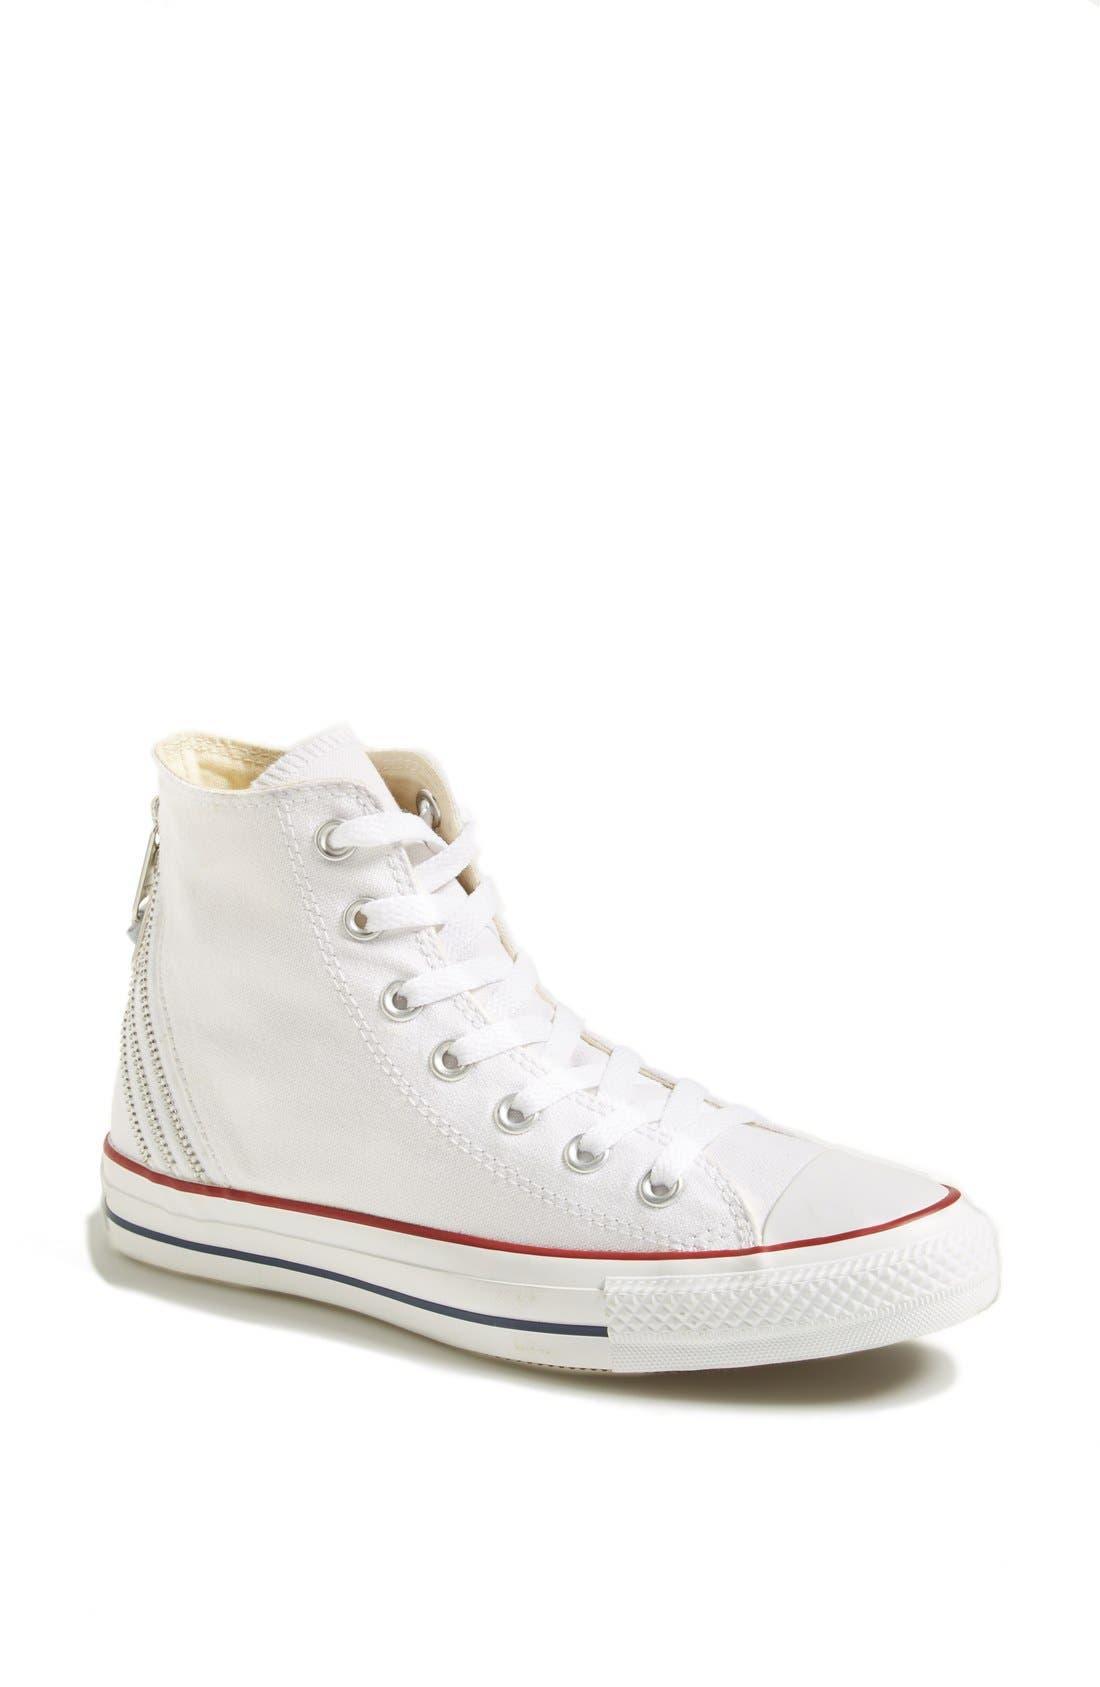 Alternate Image 1 Selected - Converse Chuck Taylor® All Star® Triple Zip Canvas Sneaker (Women)